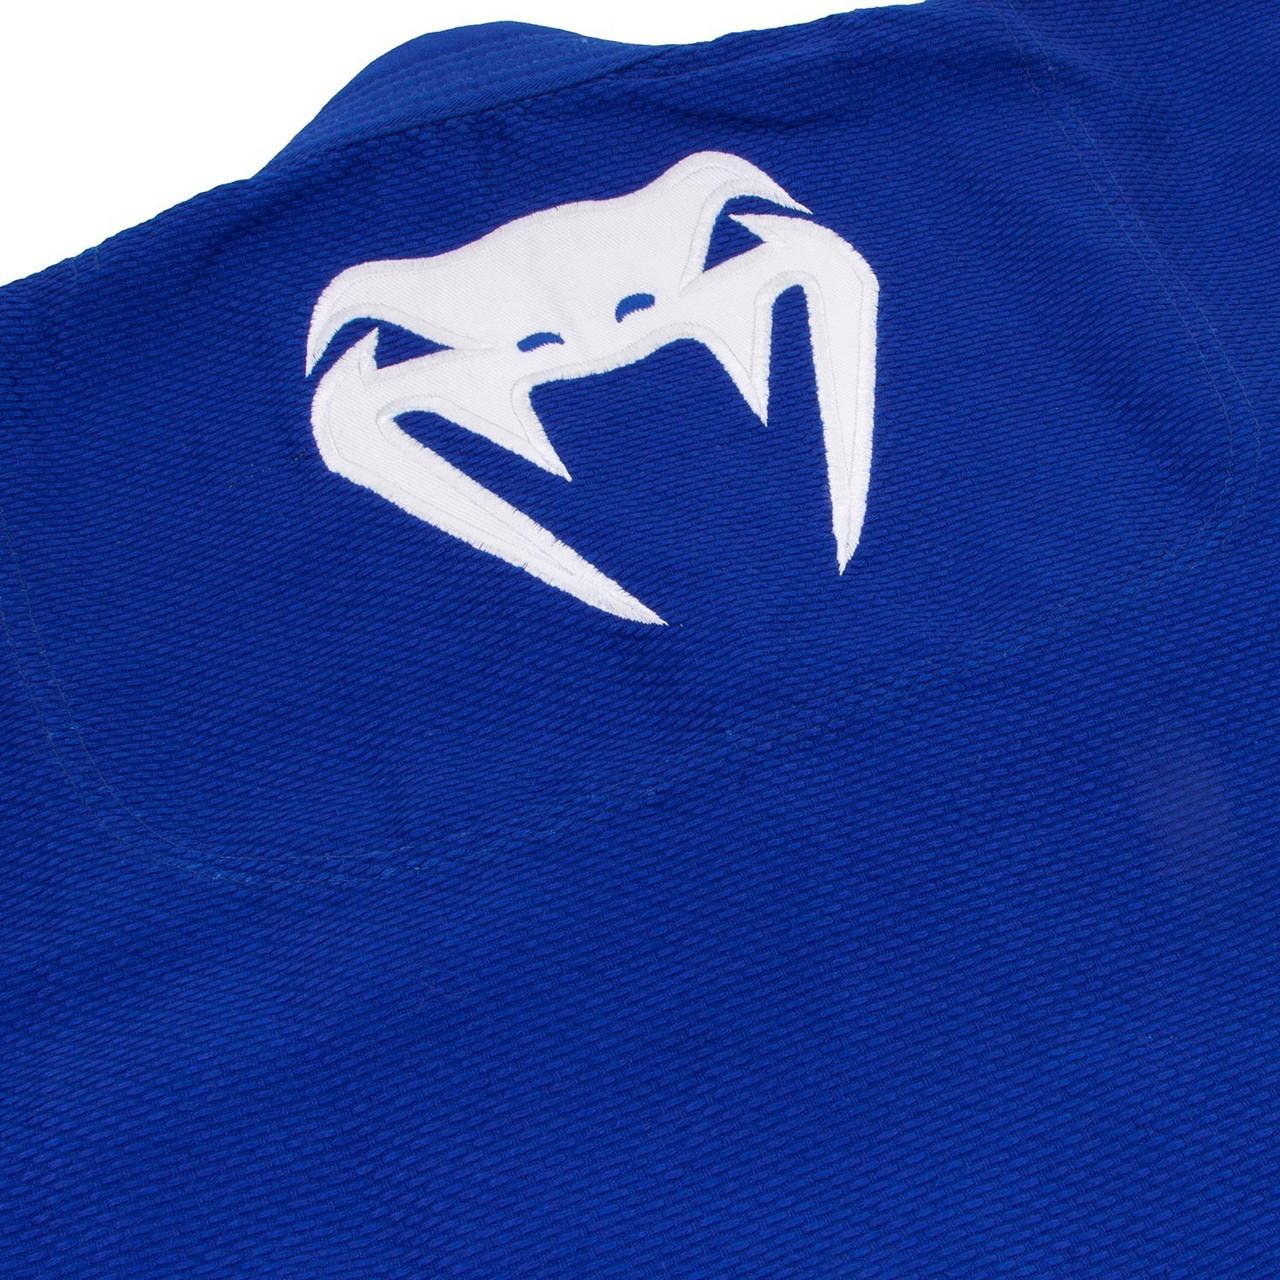 Back of the gi logo. Venum Contender 2.0 Blue BJJ GI available at www.thejiujitsushop.com  Enjoy Free Shipping from The Jiu Jitsu Shop today!